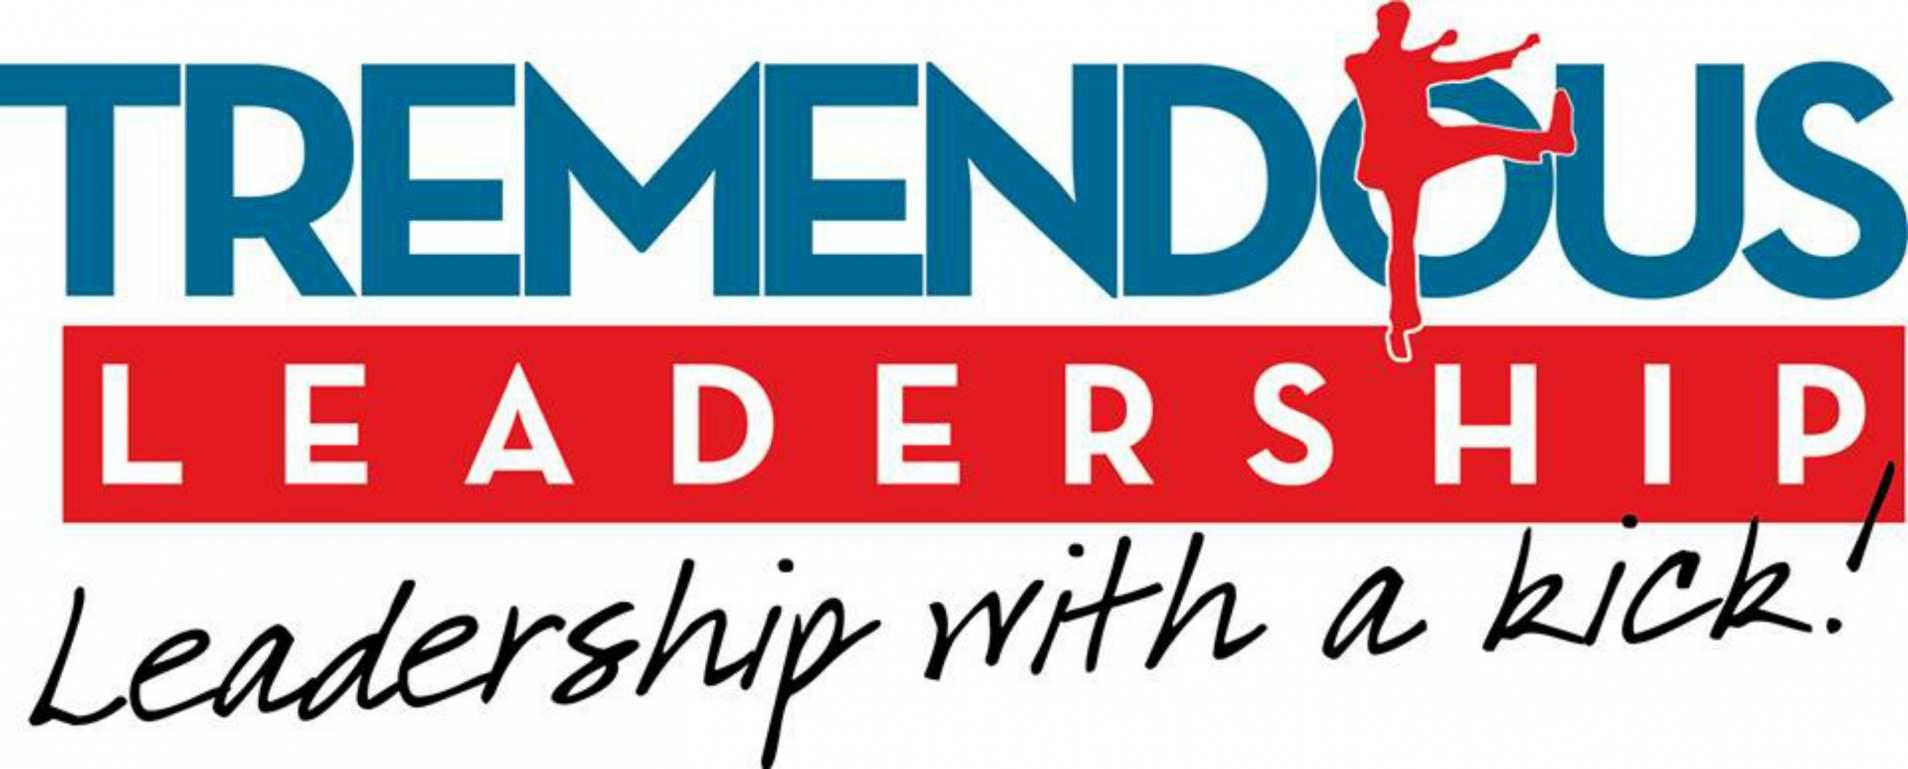 Tremendous Leadership Logo